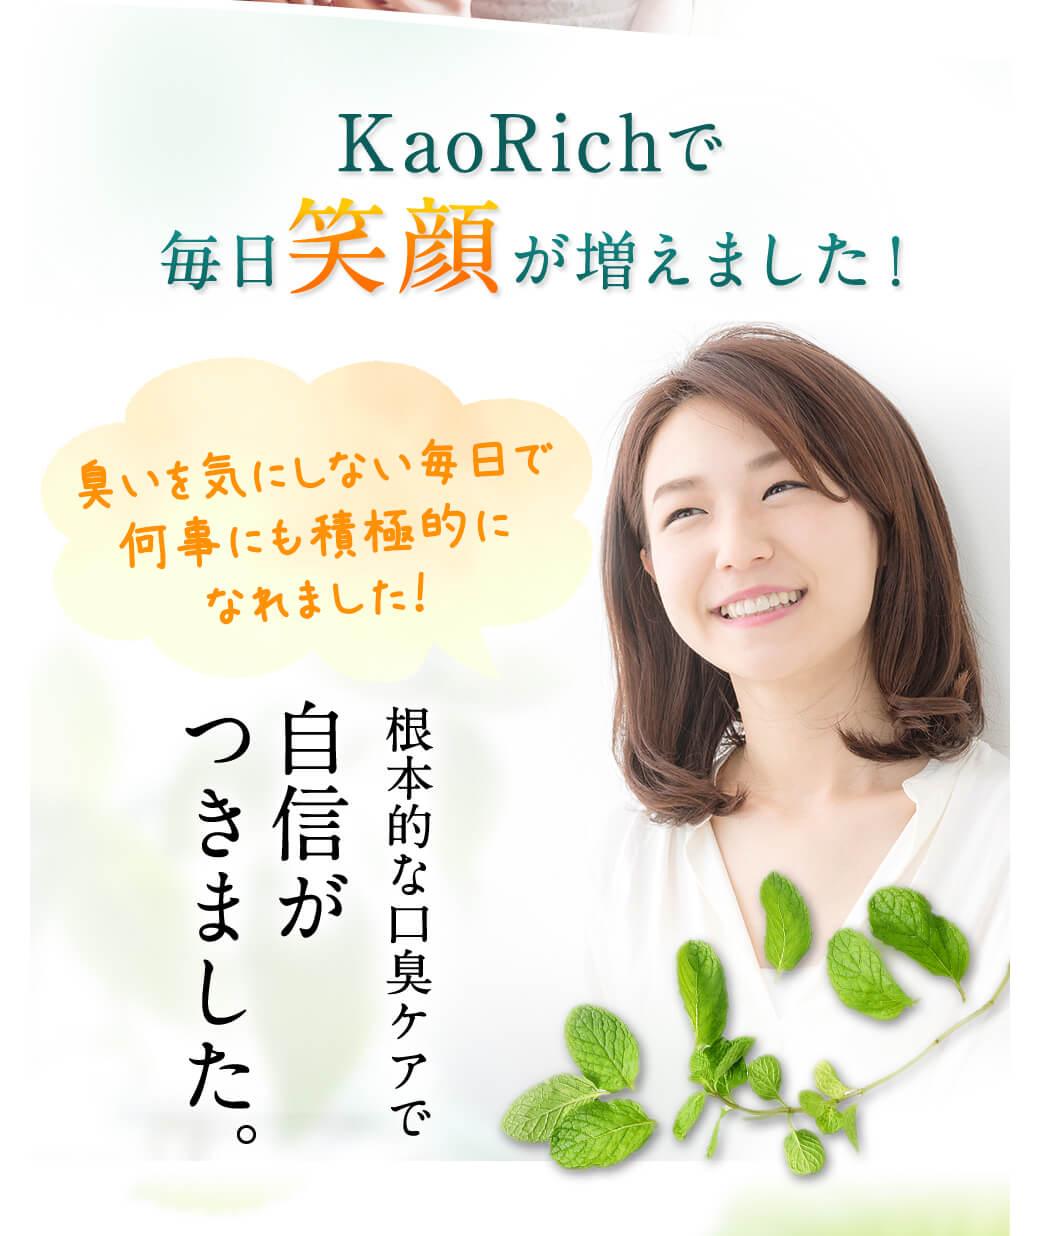 KaoRichで毎日笑顔が増えました!「臭いを気にしない毎日で何事にも積極的になれました!」根本的な口臭ケアで自信がつきました。